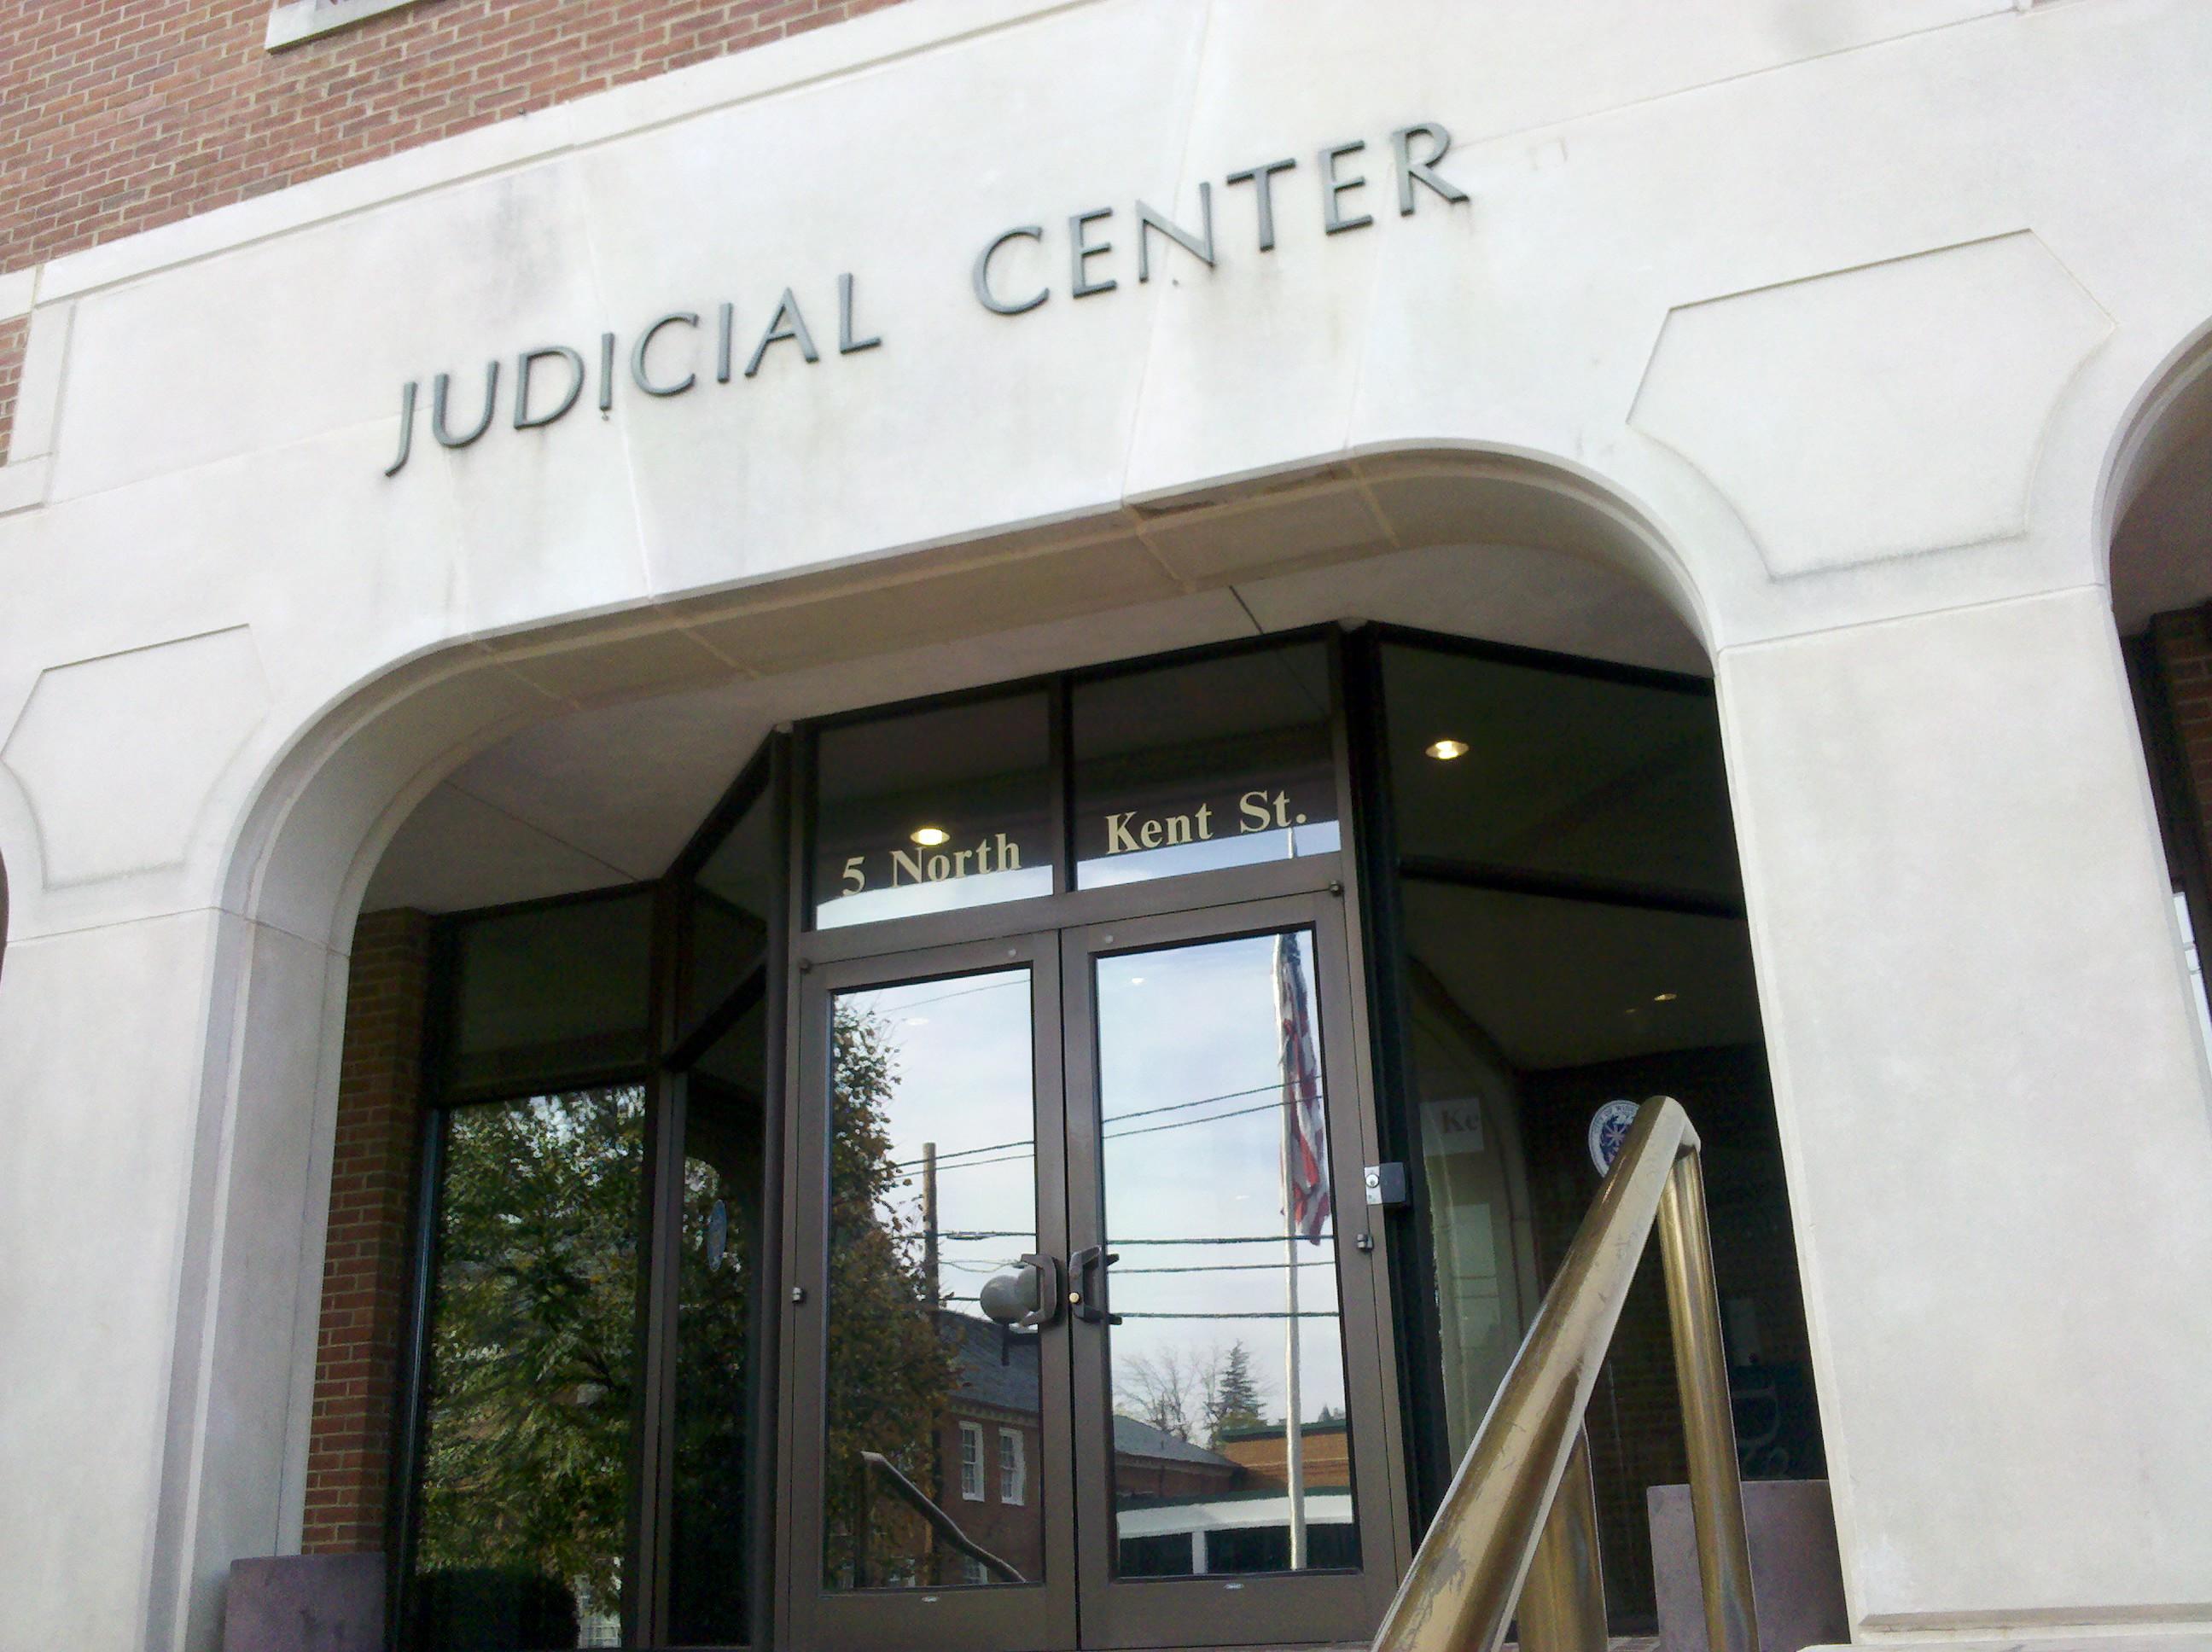 Joint Judicial Center